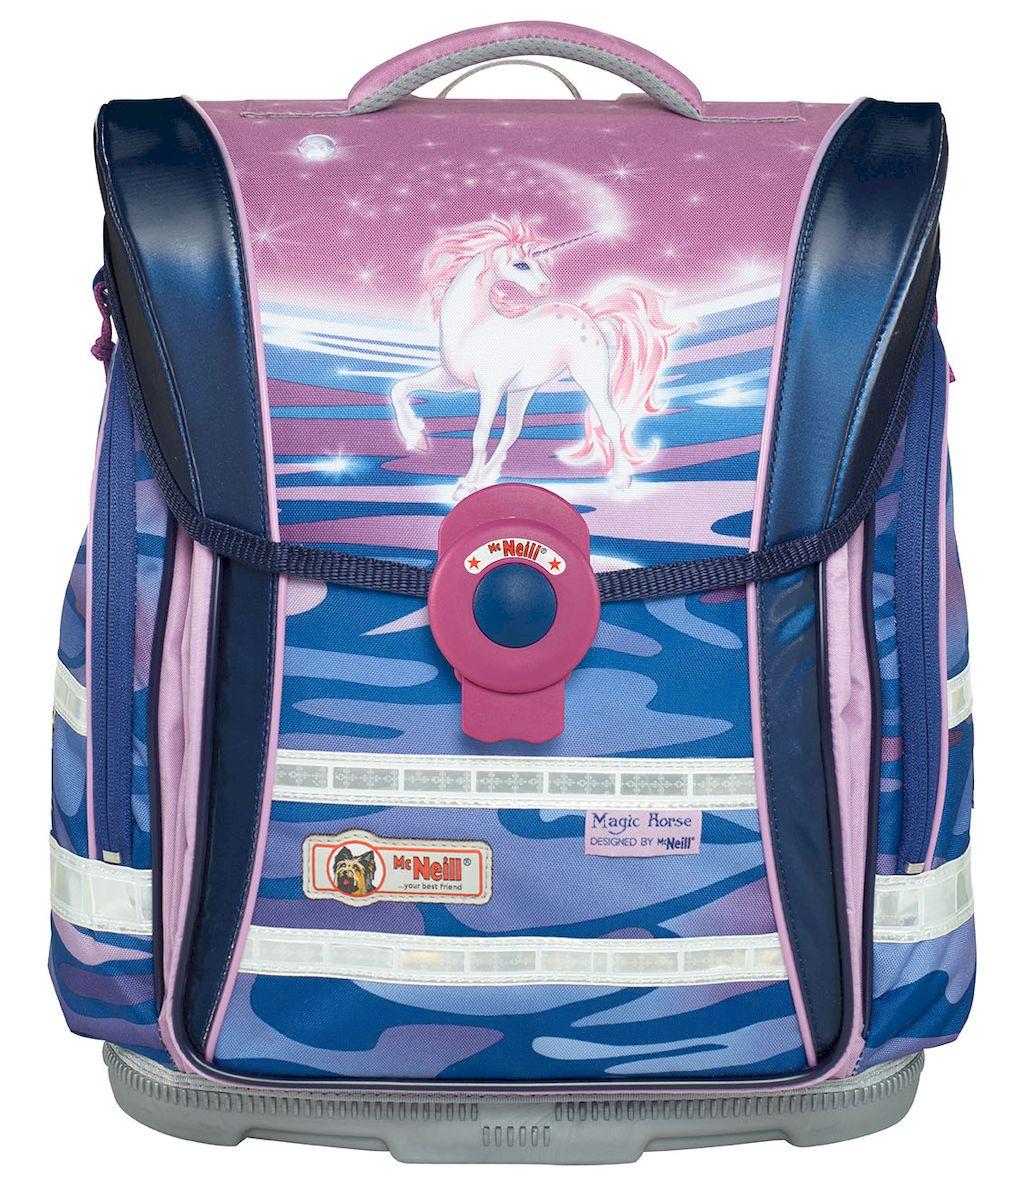 McNeill Ранец школьный Ergo Light Compact Единорог9604161000